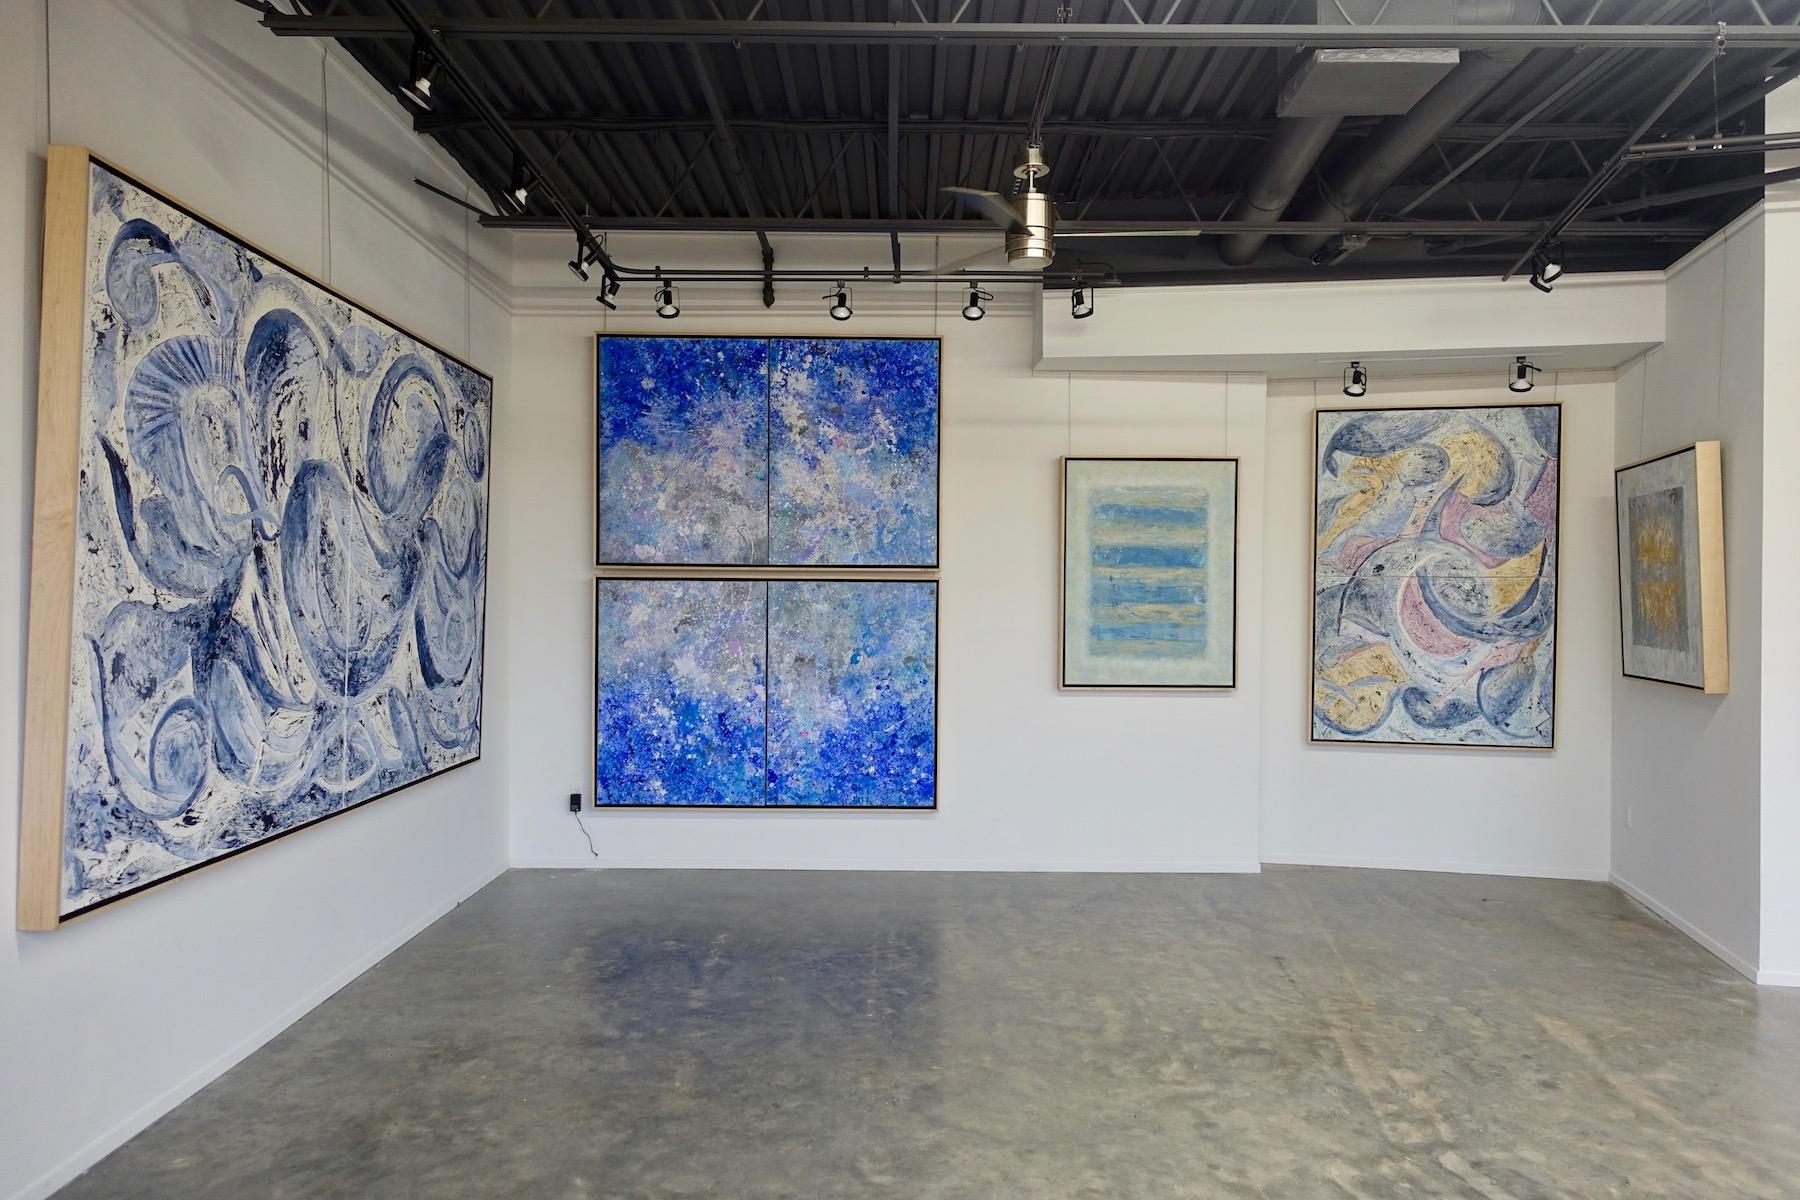 Installation view, Jill Krutick, 2018